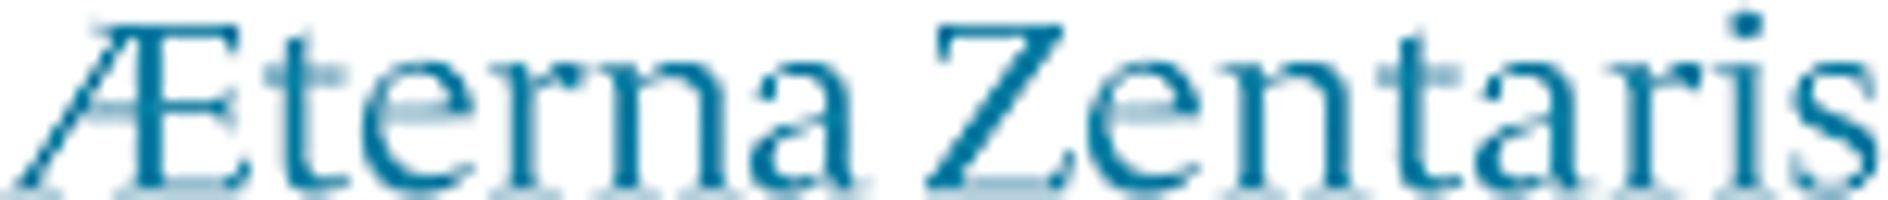 AEterna Zentaris Inc. (AEZS-T)